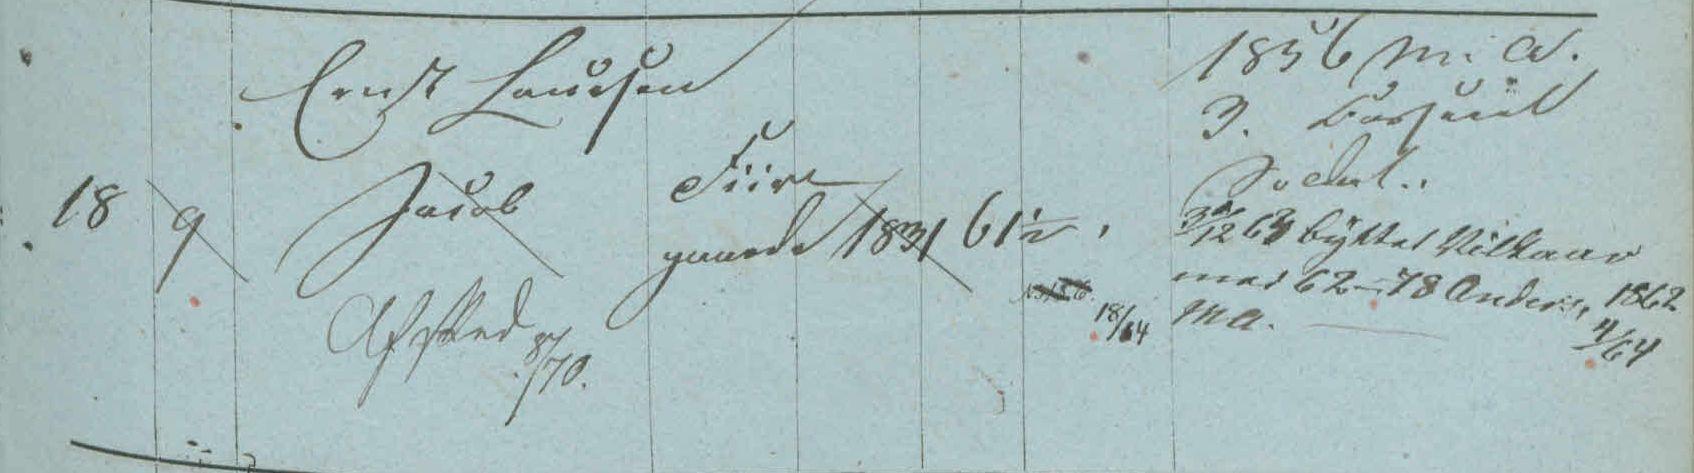 1859 Jacob Ernstsen